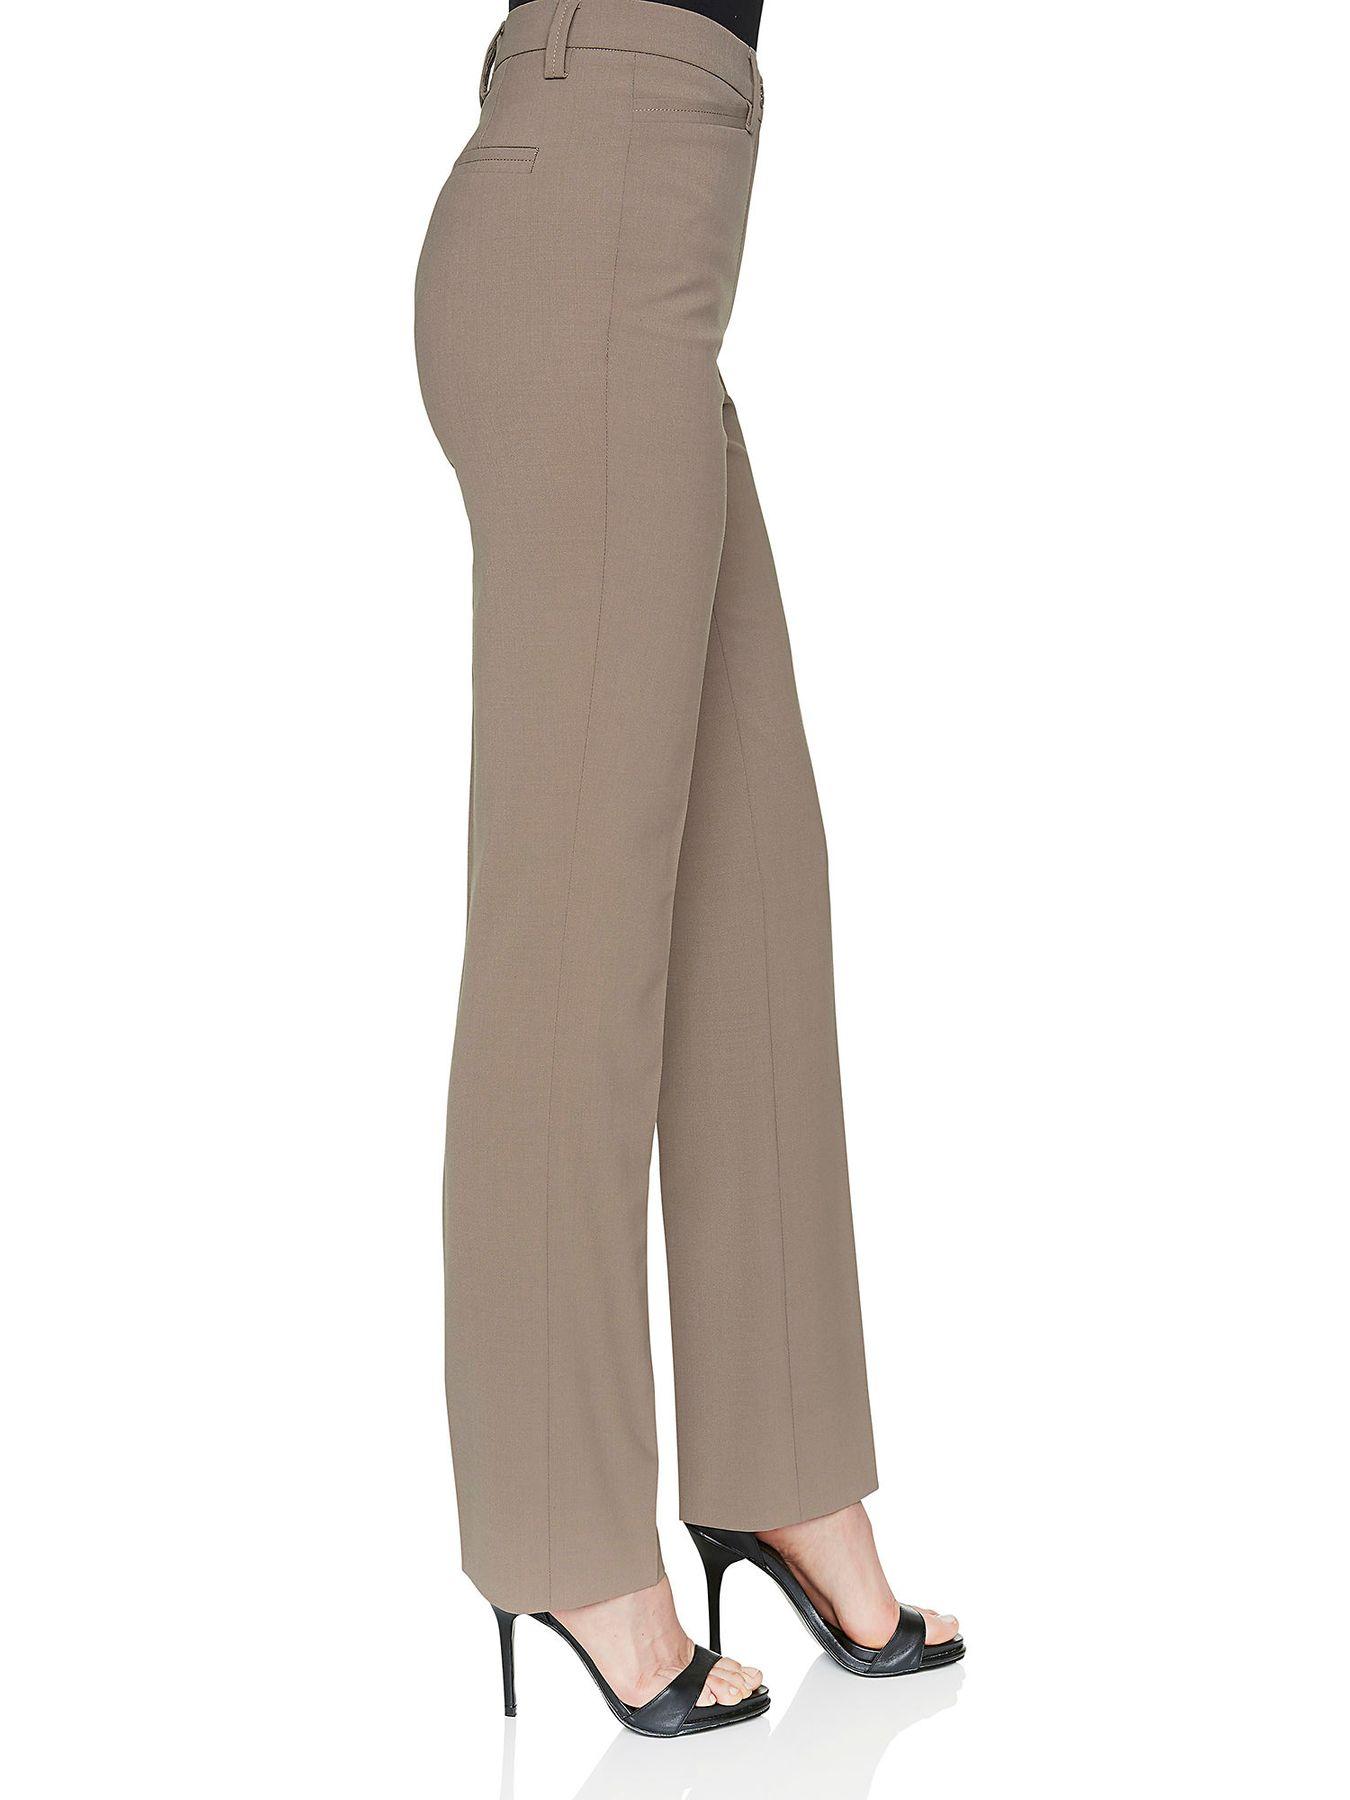 Atelier Gardeur - Special Fit - Damenhose - Kayla (061458) – Bild 11